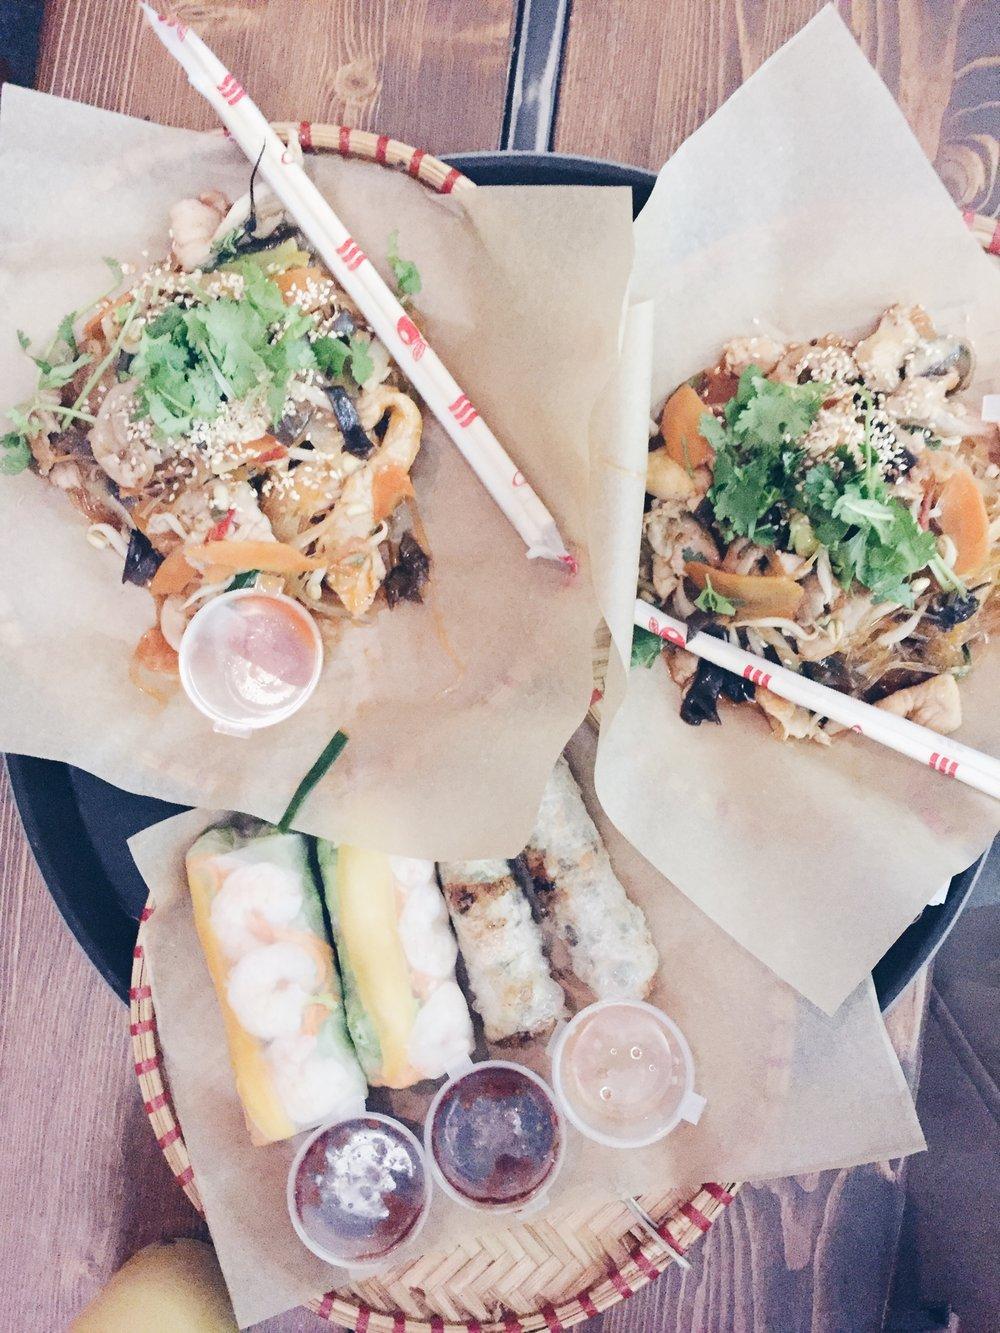 Dinner at Cafe Bo - Nem ran (crispy rolls)Mien xao (glass noodles)Goi Cuon (spring rolls)